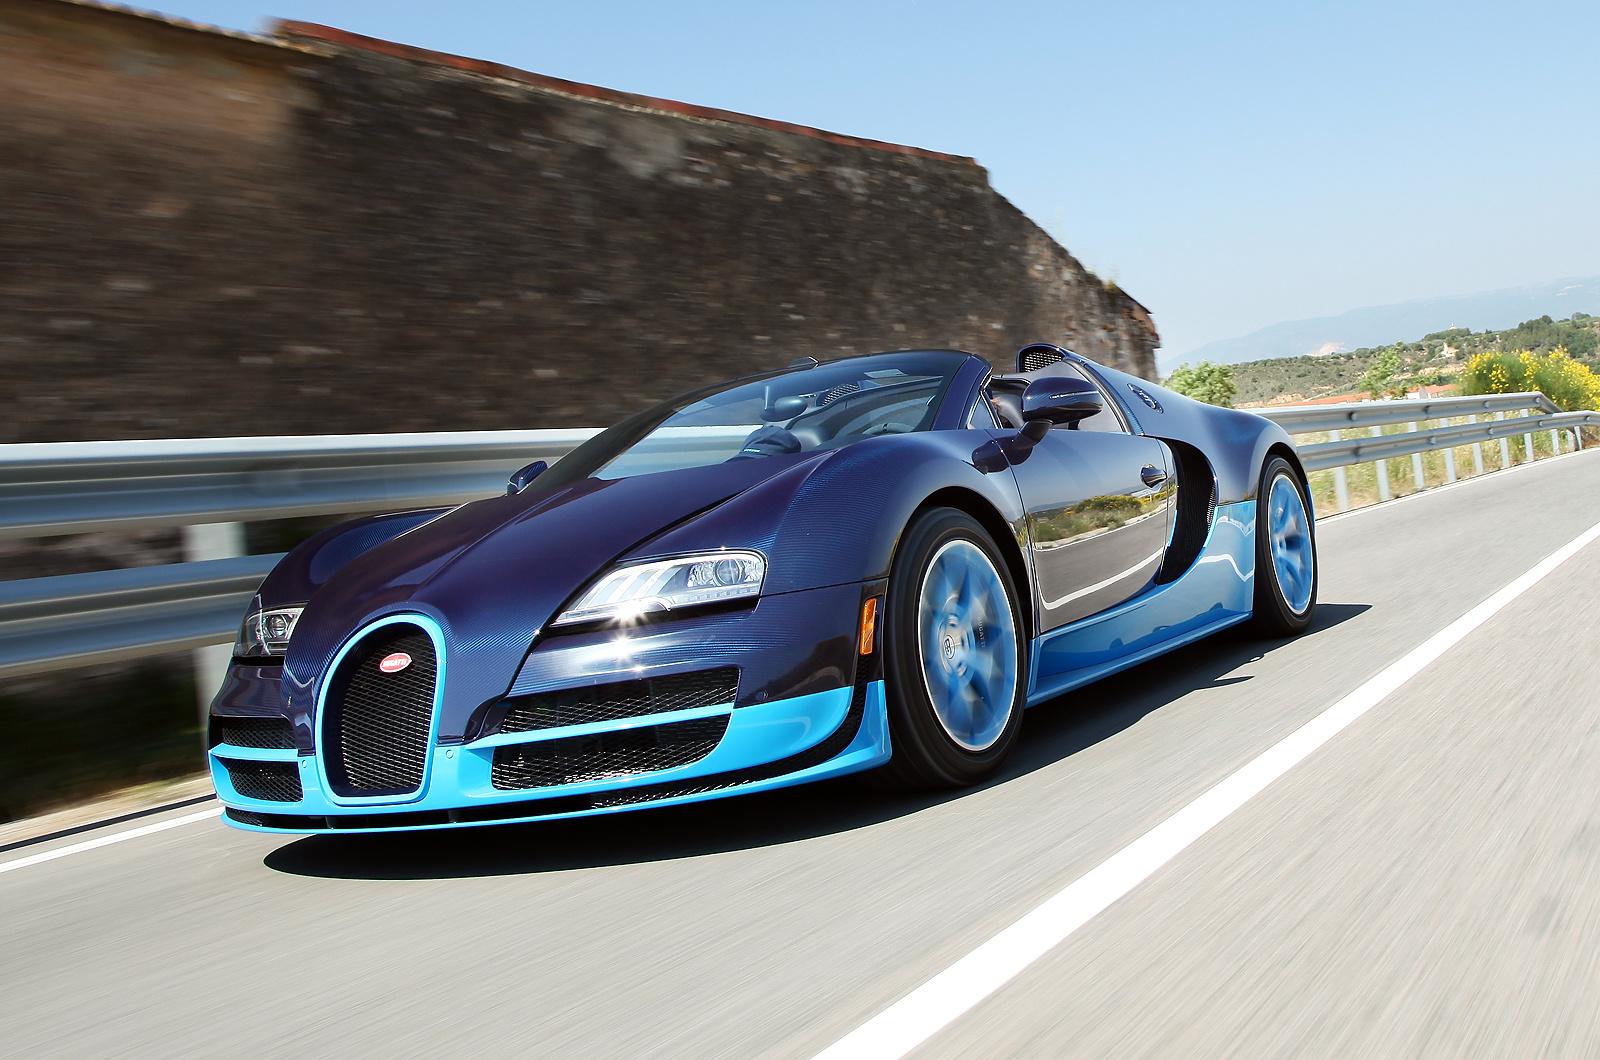 bugatti readying veyron successor car news super cars autocar india. Black Bedroom Furniture Sets. Home Design Ideas